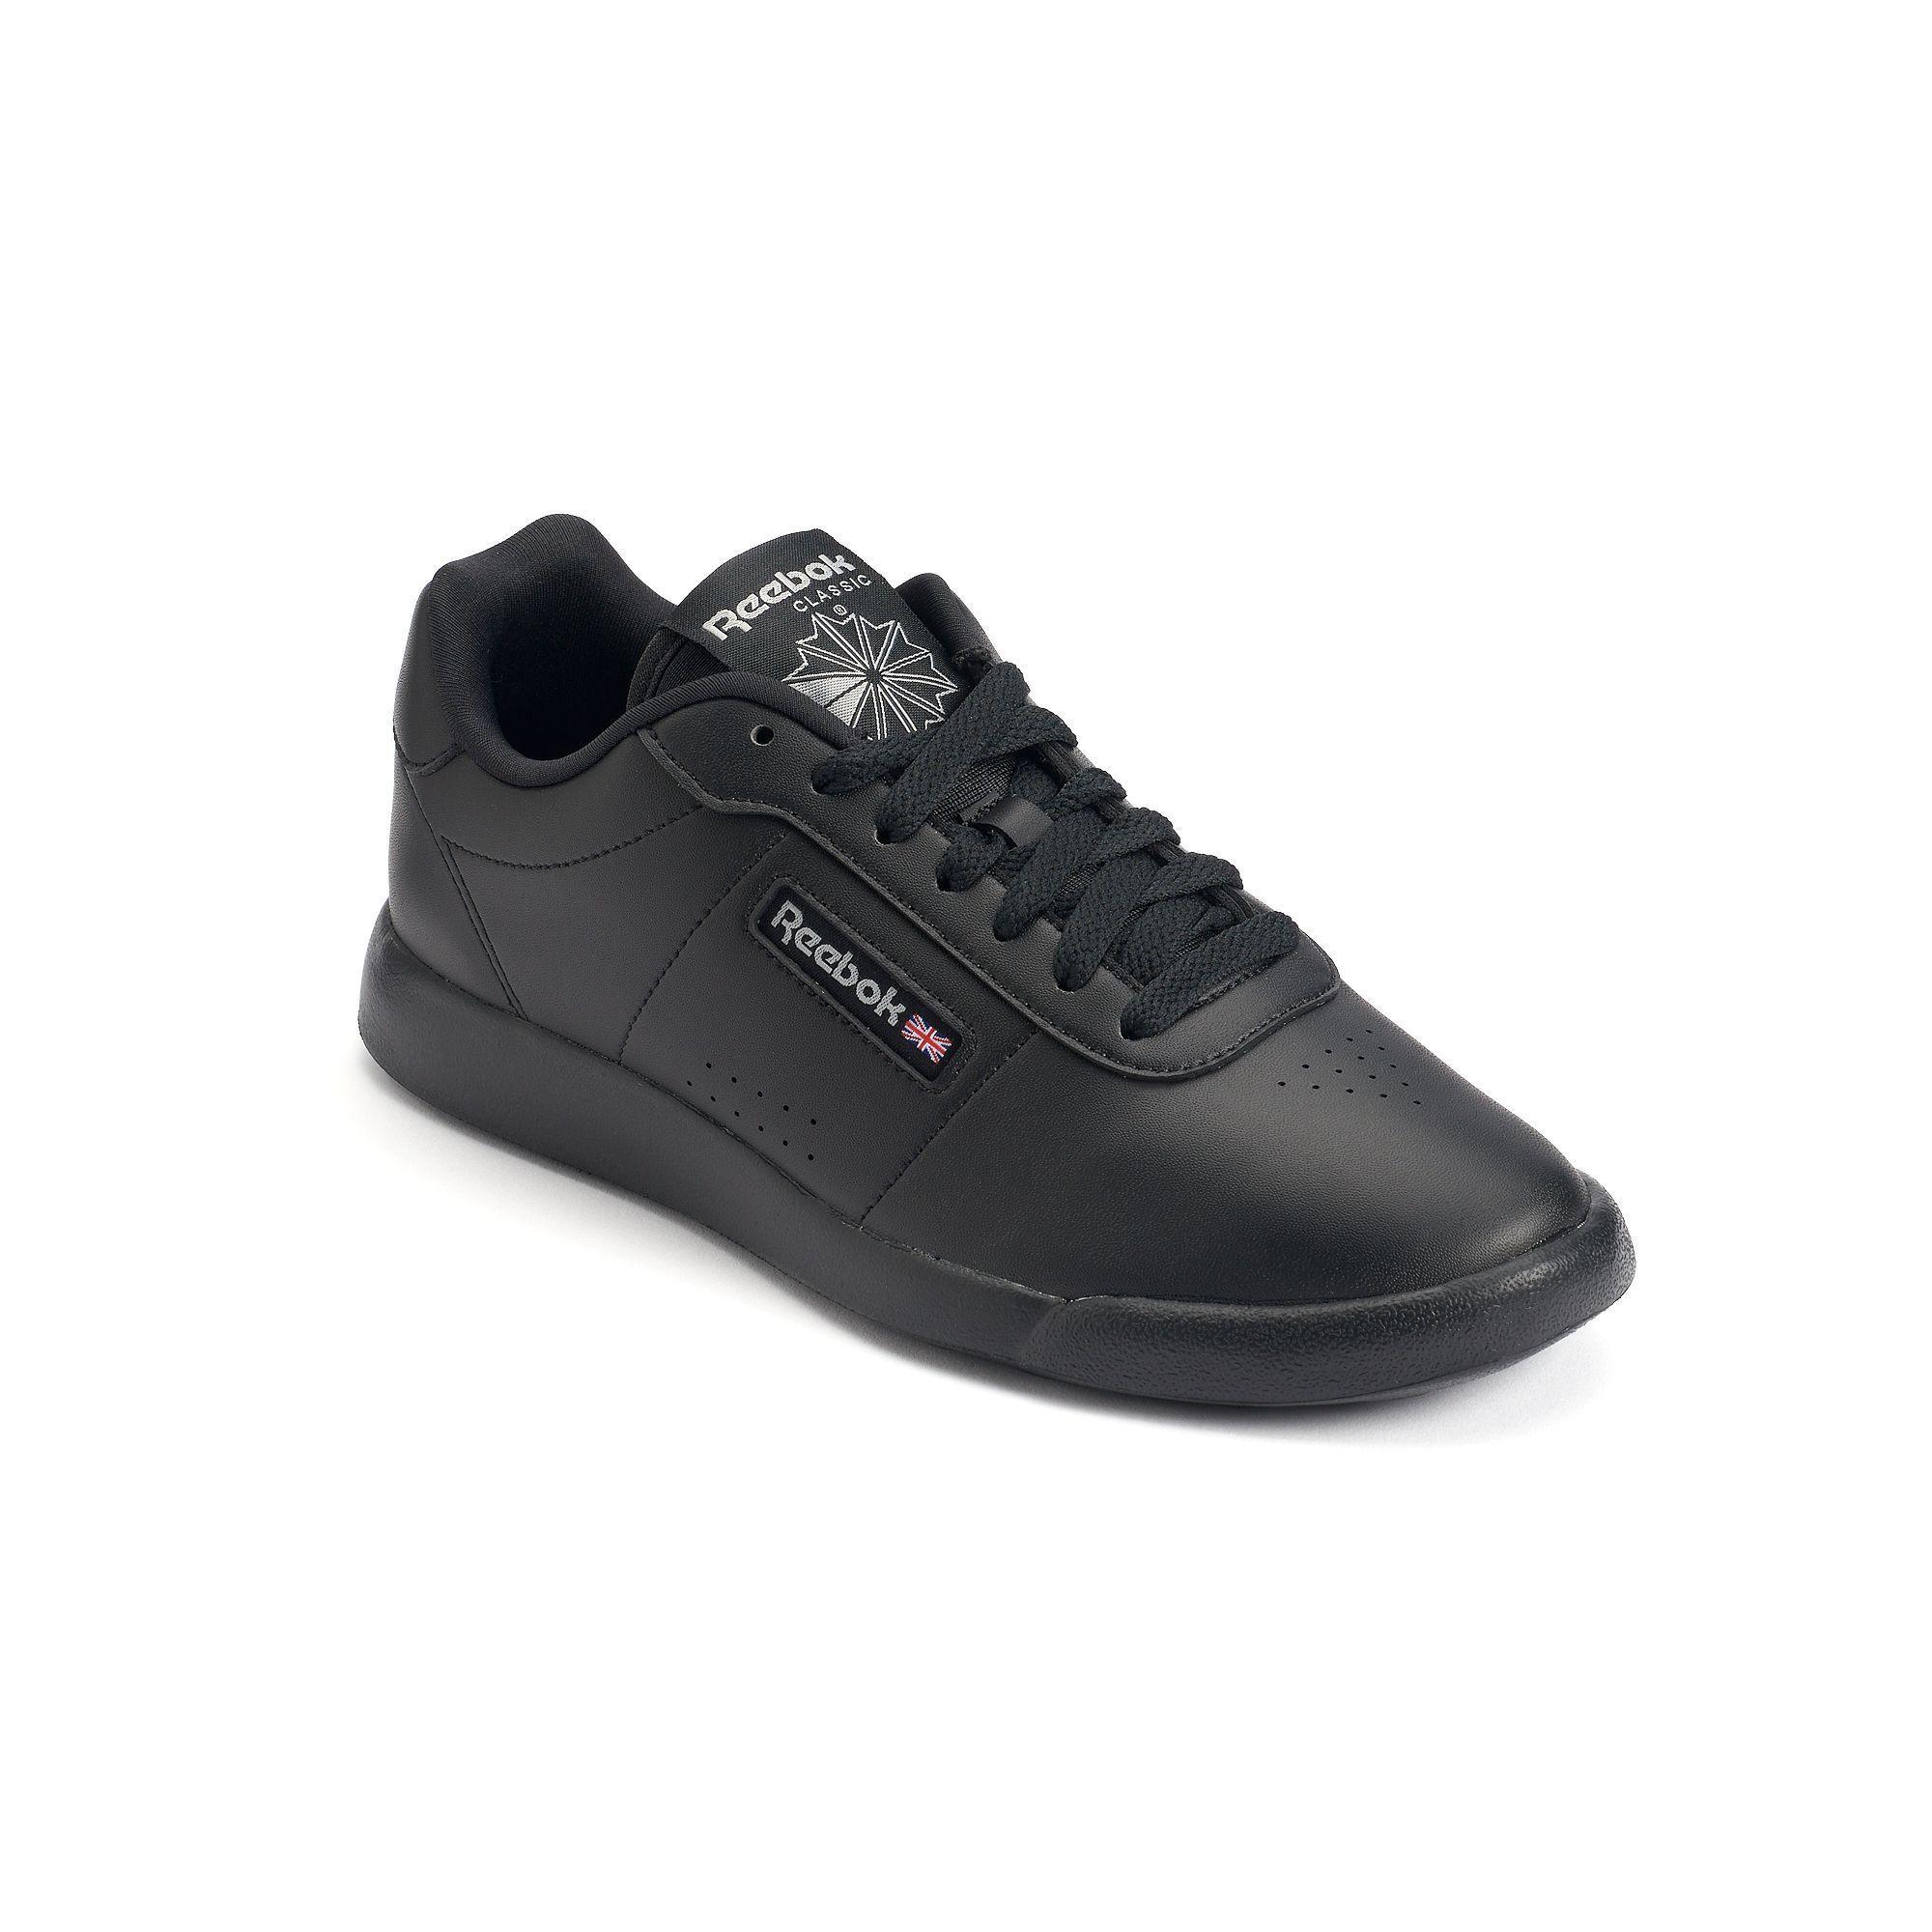 ee0ca1e9fd458 Reebok Princess Lite Women s Shoes